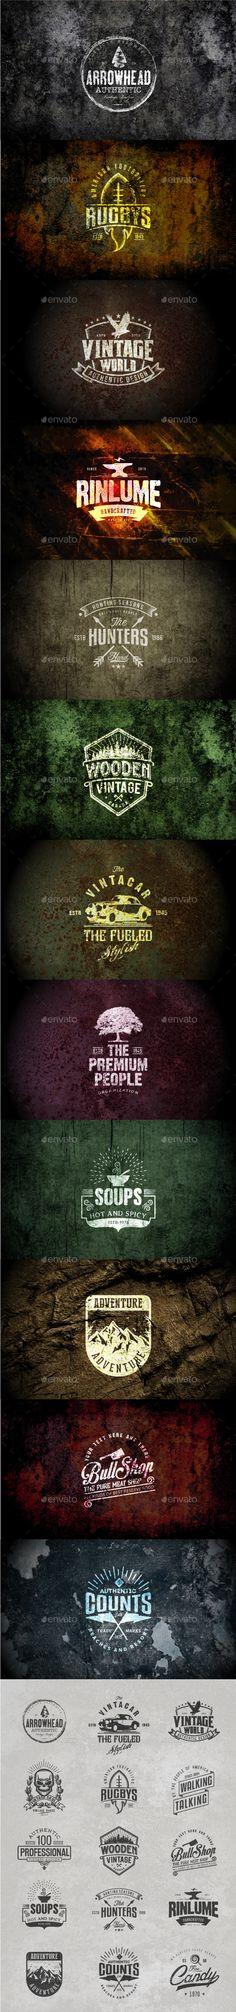 Grunge Badges and Logos #design Download: http://graphicriver.net/item/grunge-badges-and-logos-vol01/13316784?ref=ksioks